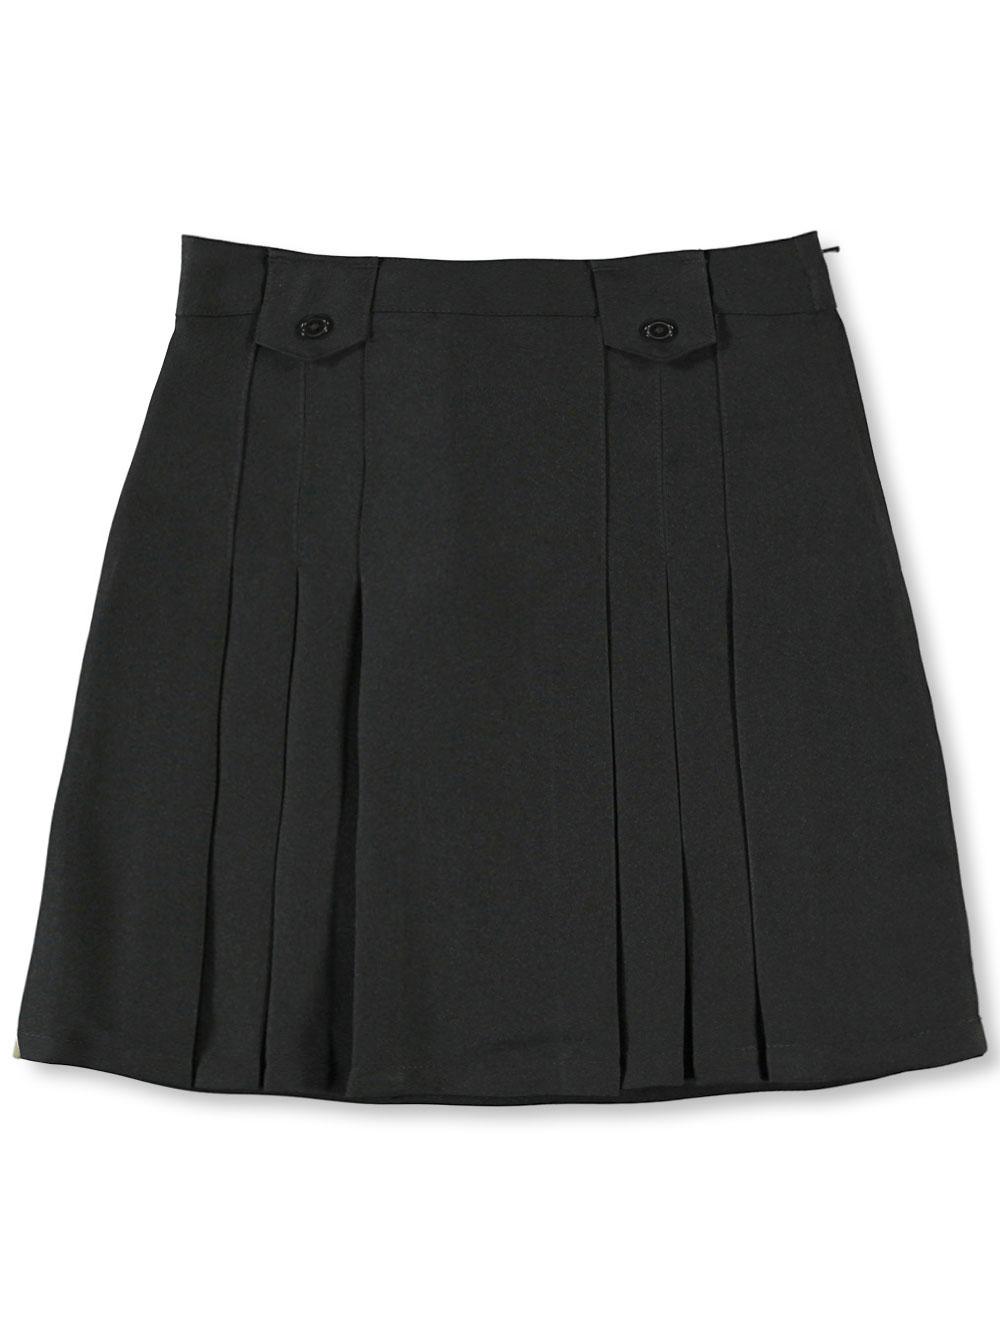 French Toast School Uniform Big Girls' Pleat and Tab Skirt (Sizes 7 - 20) - black, 20